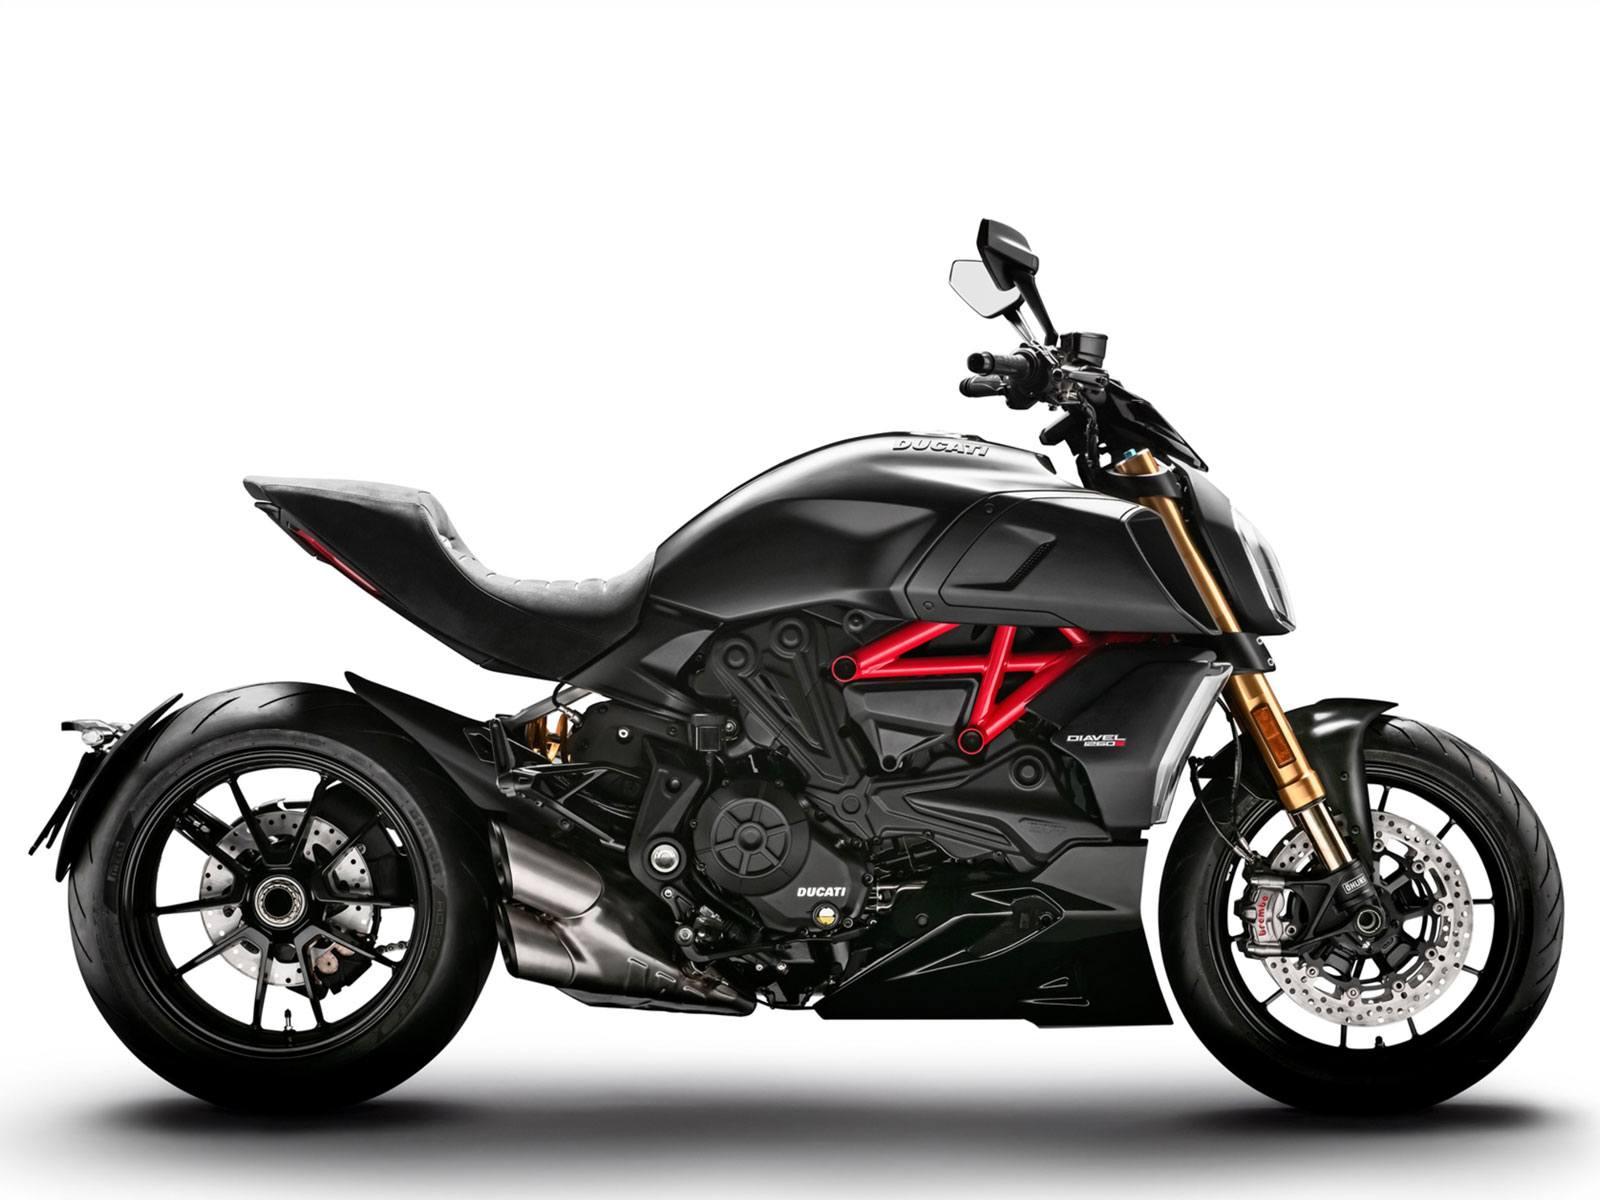 Мотоцикл DUCATI Diavel 1260 S - Total Black (2019)